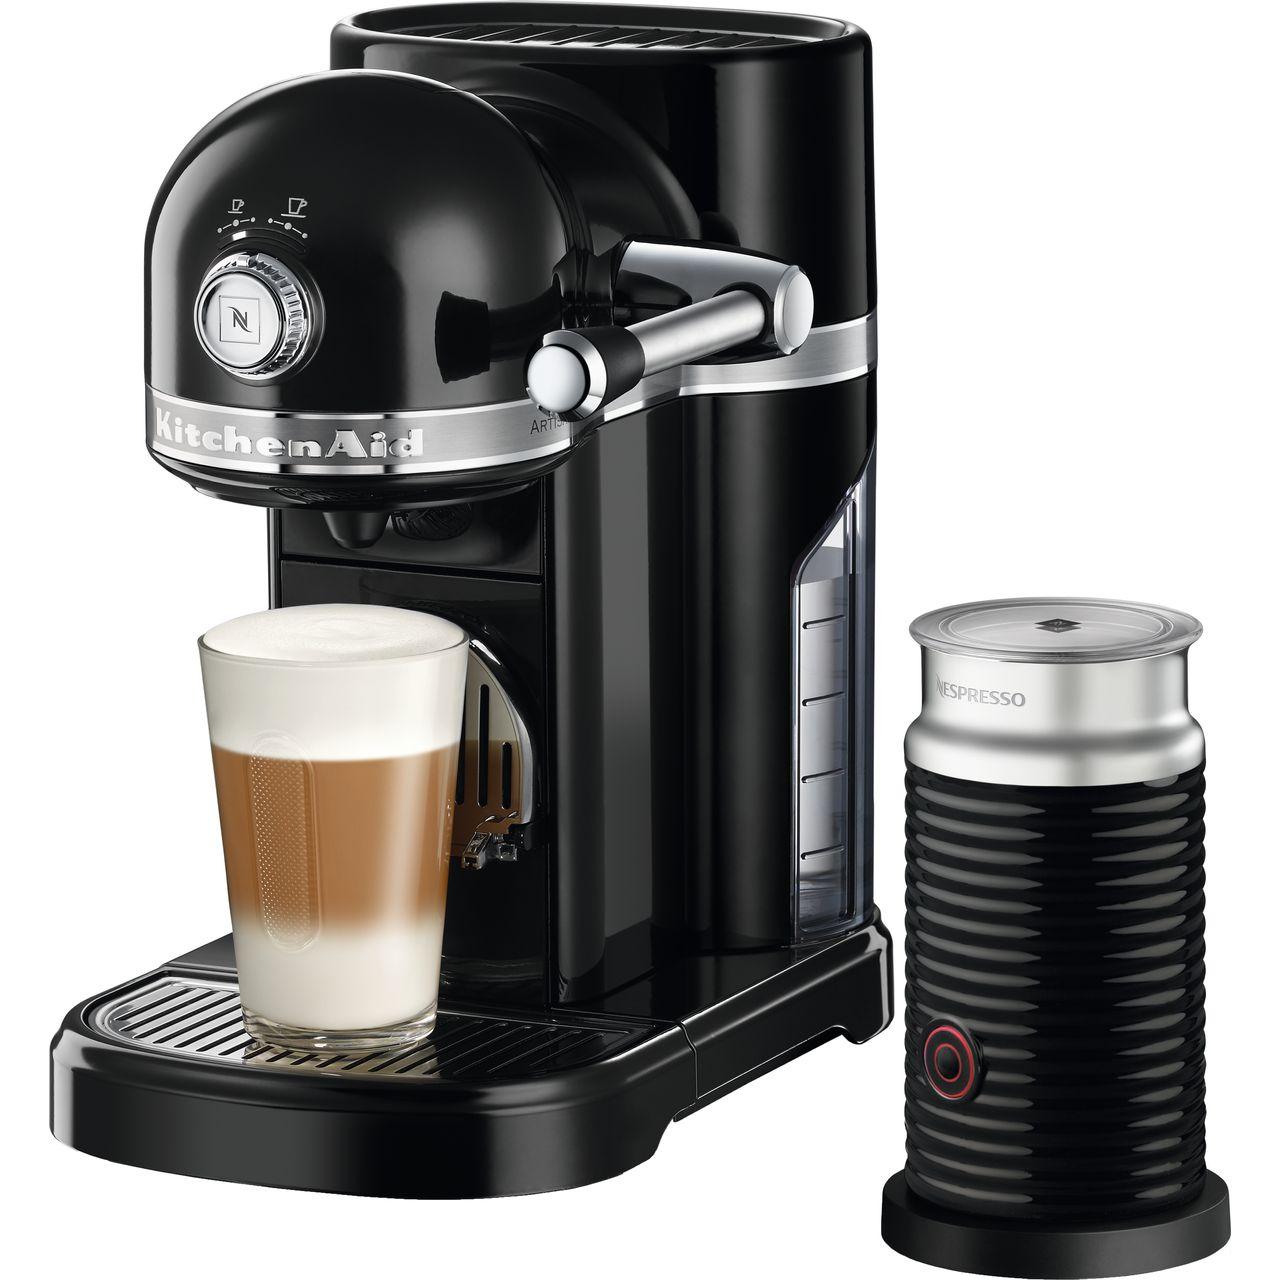 Aeroccino Nespresso Motor